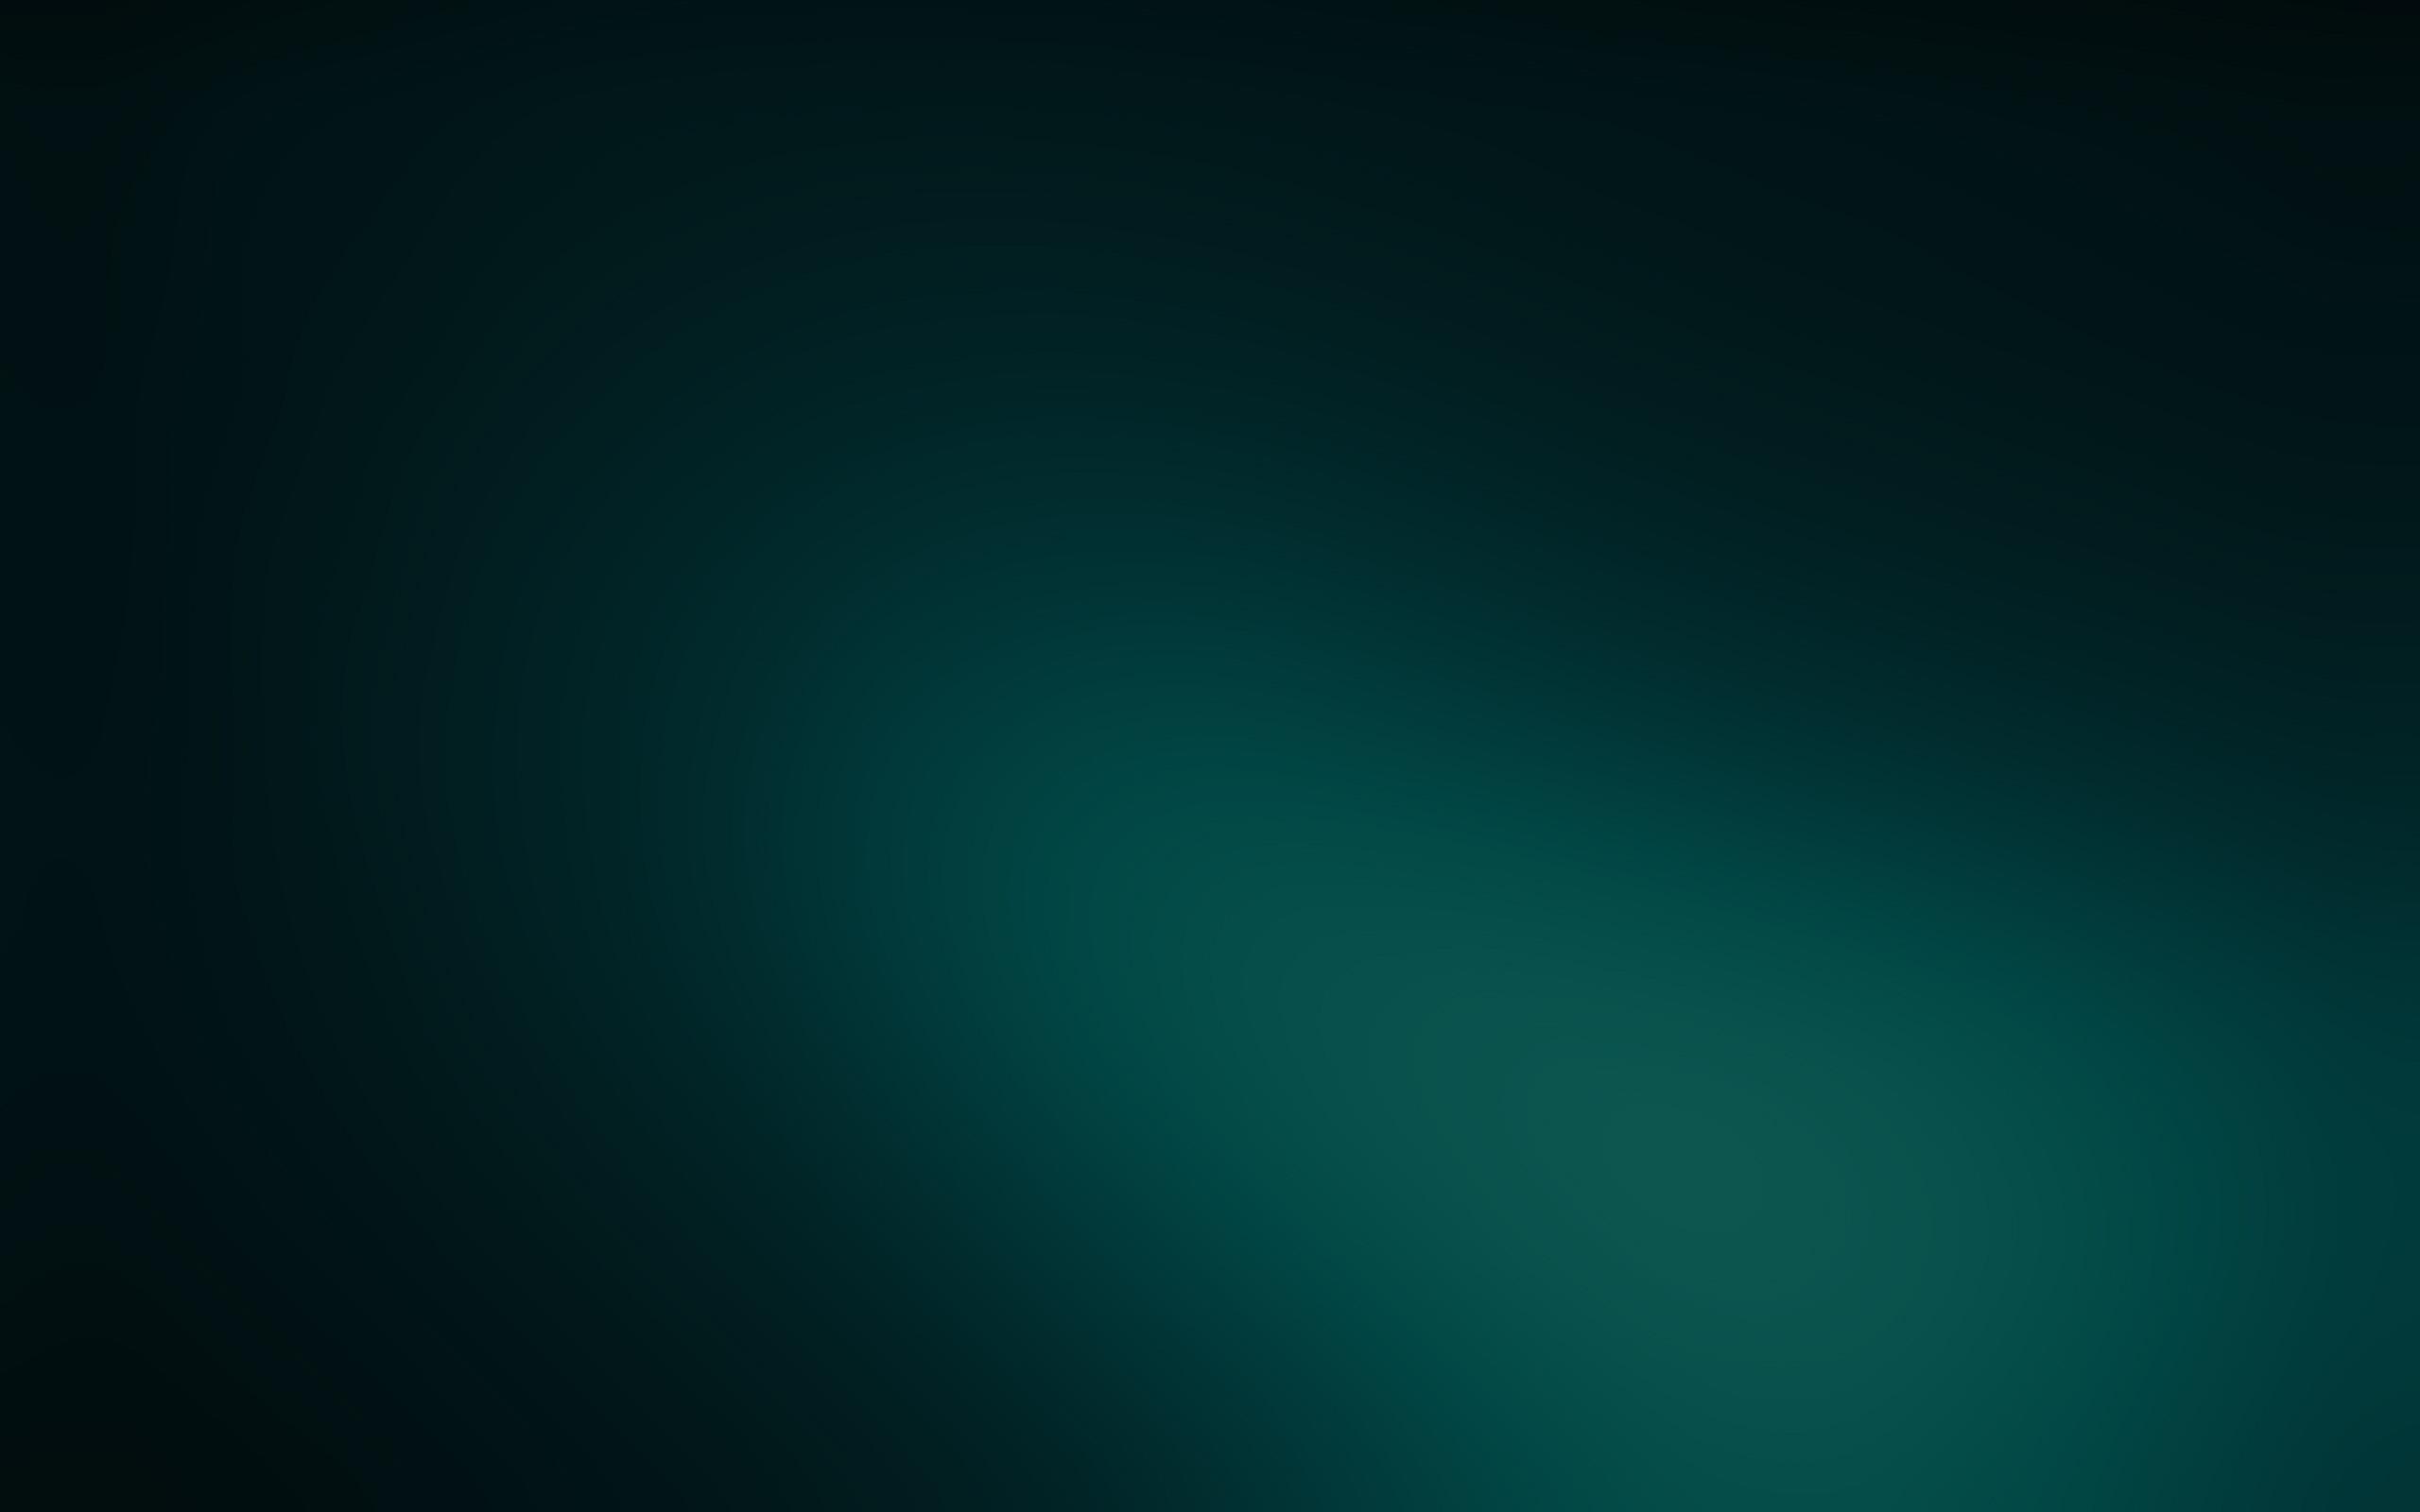 … Gradient Background Best Wallpaper 16349 …